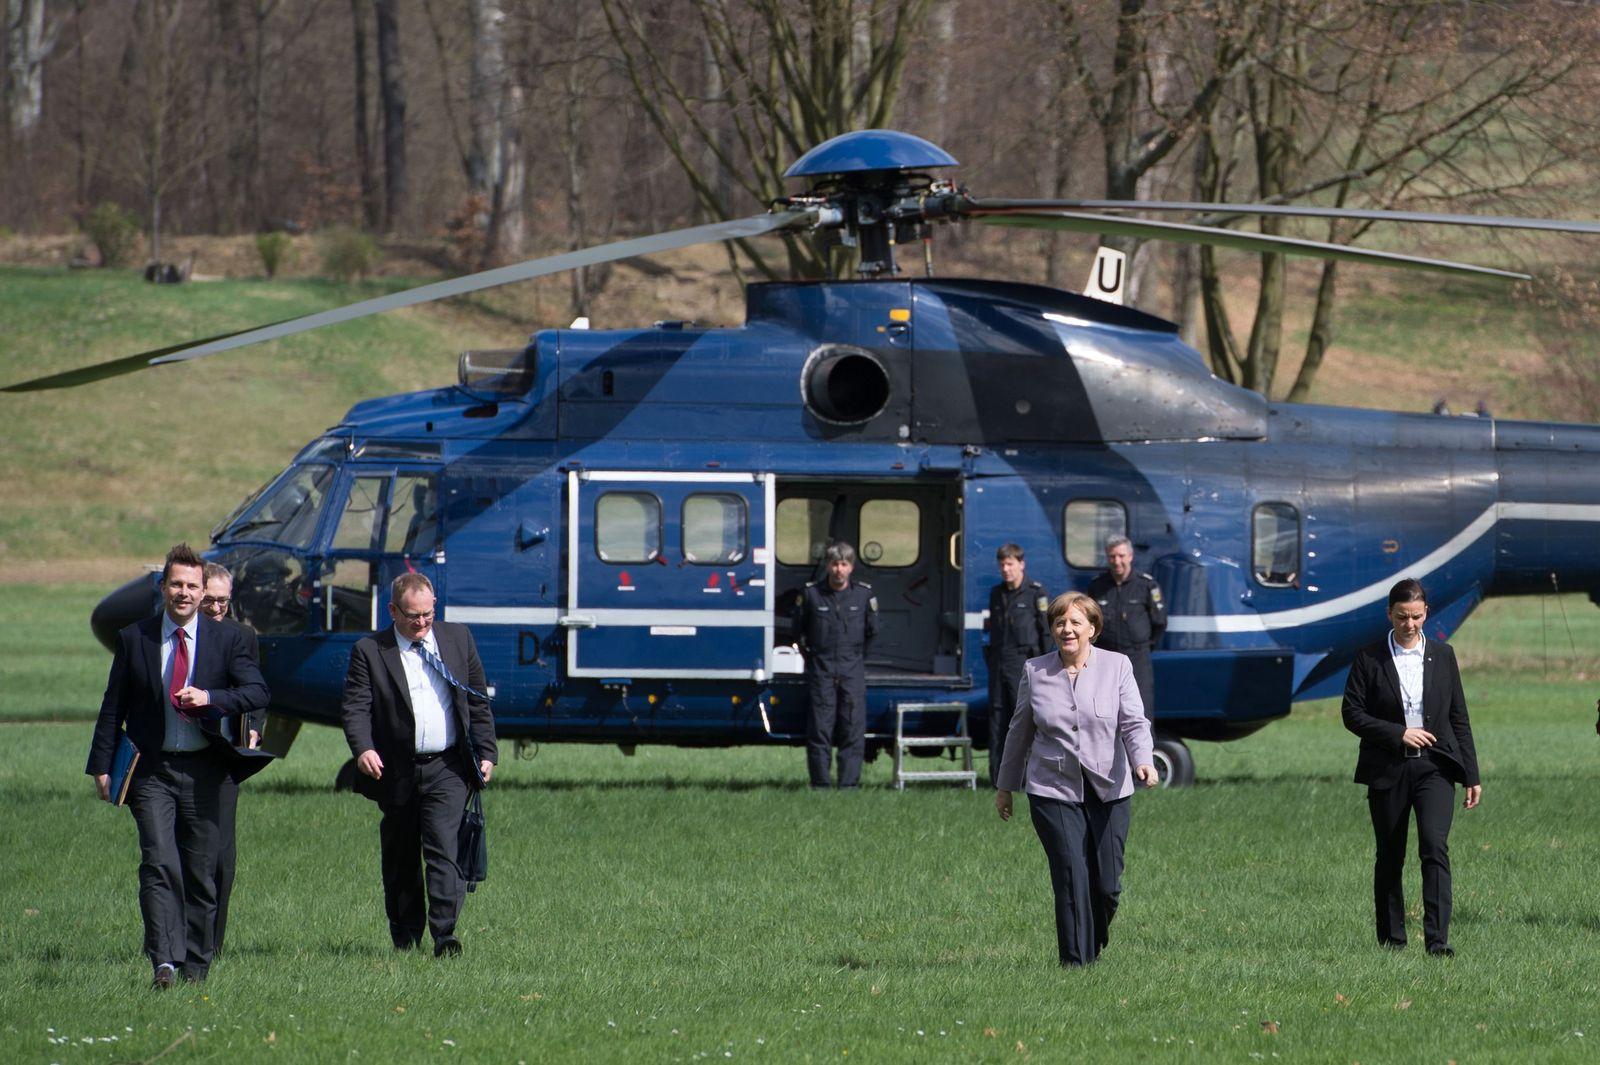 Angela Merkel / Helikopter